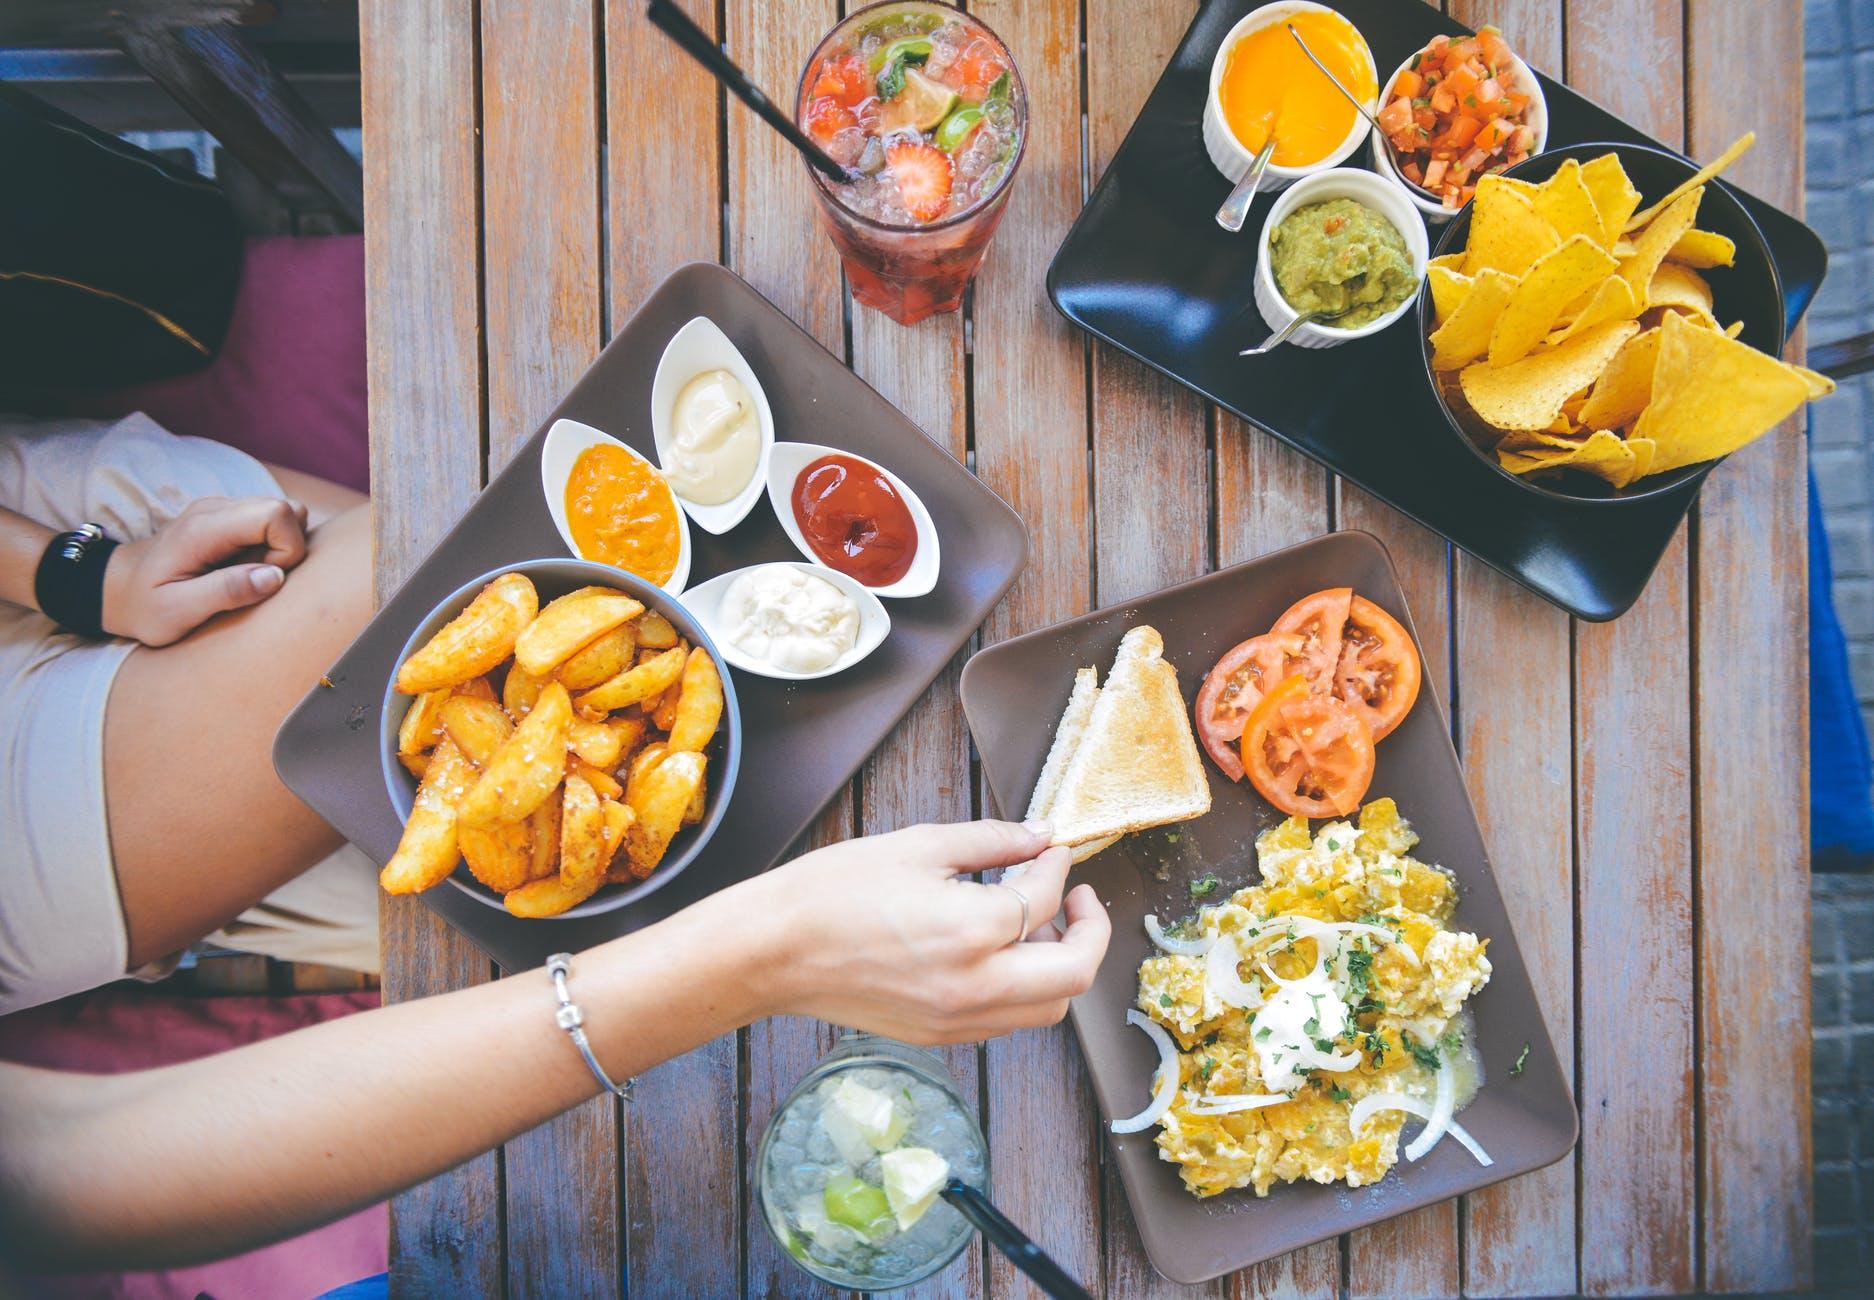 food-salad-restaurant-person.jpg